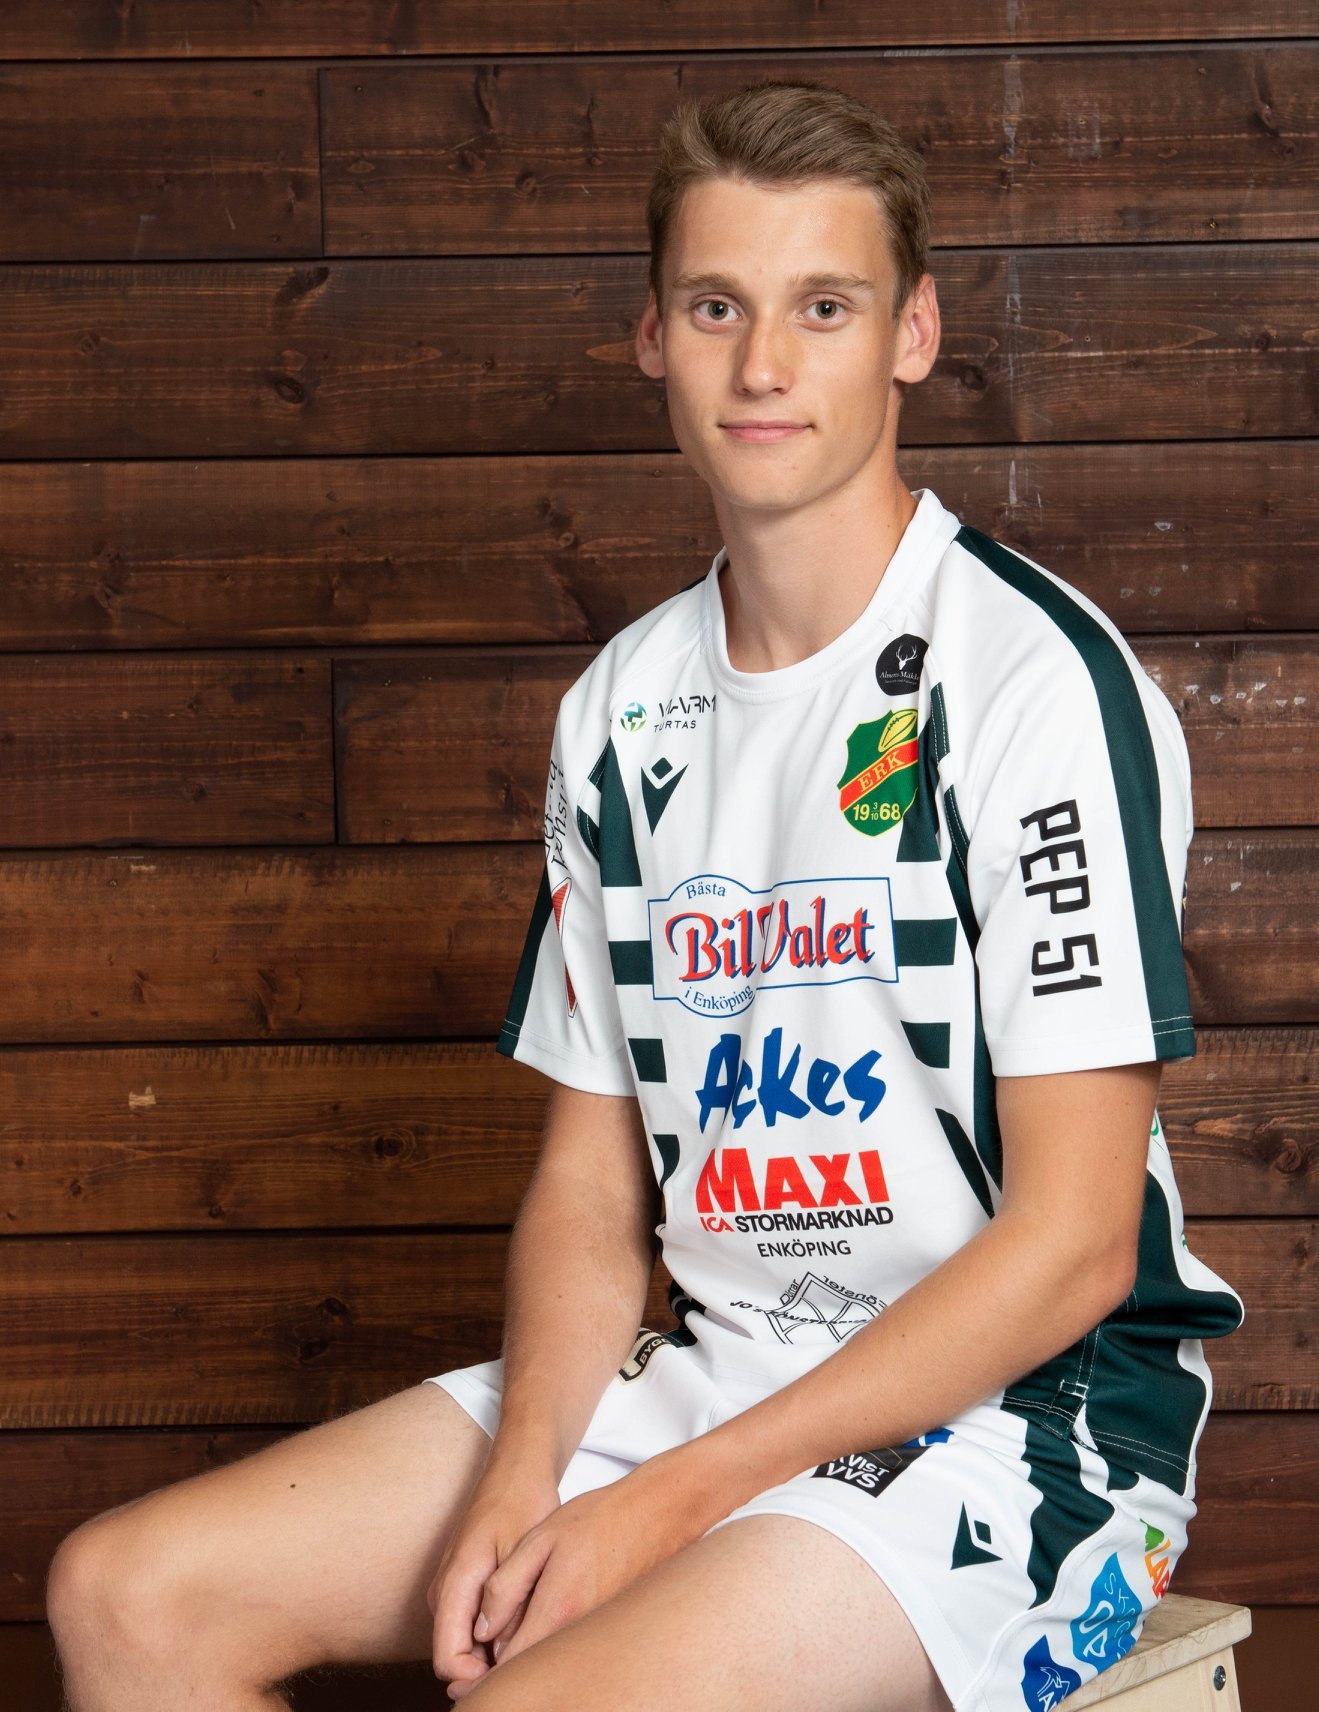 Nils Heierhoff